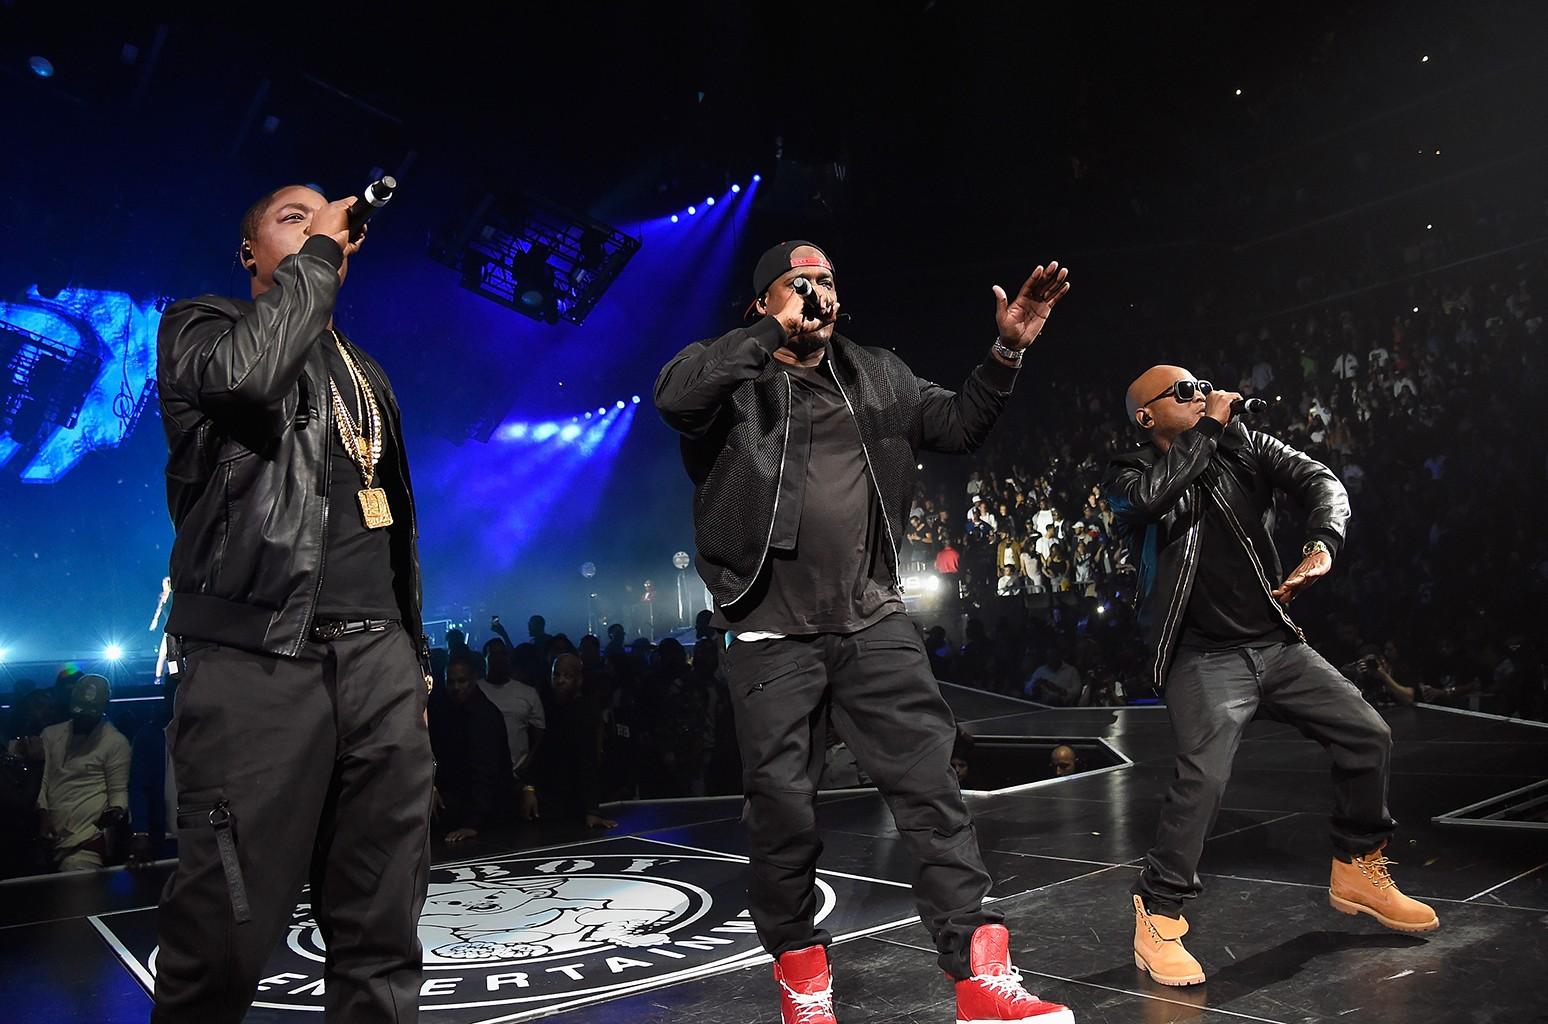 Jadakiss, Sheek Louch and Styles P of The Lox